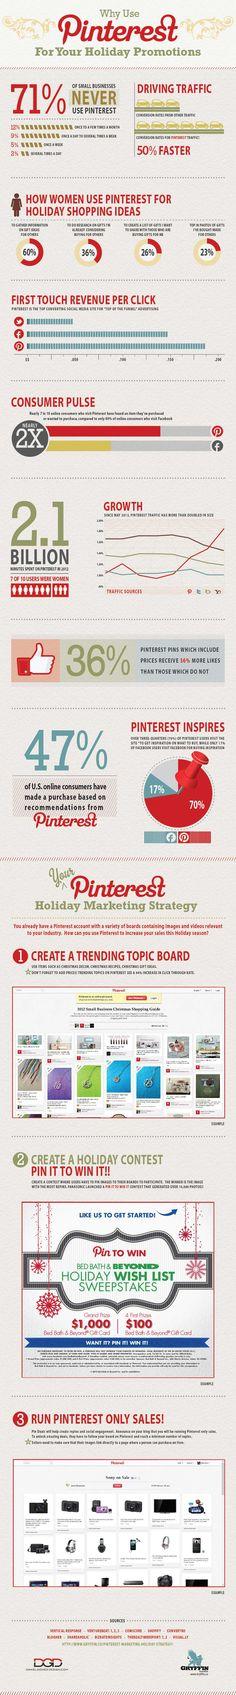 Pinterest Holiday Marketing Tips & Statistics #infographic